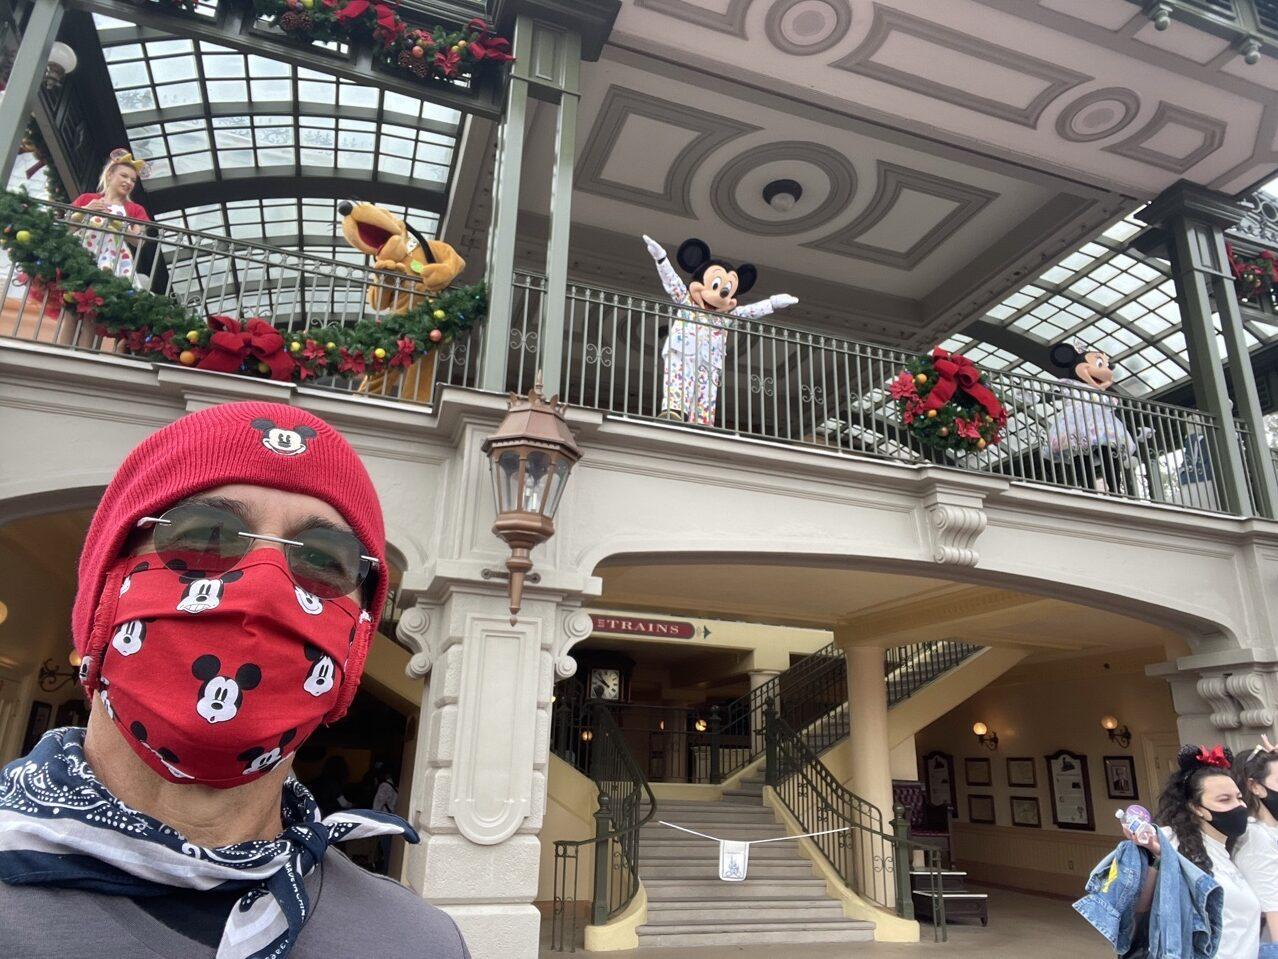 Disney characters at Train Station